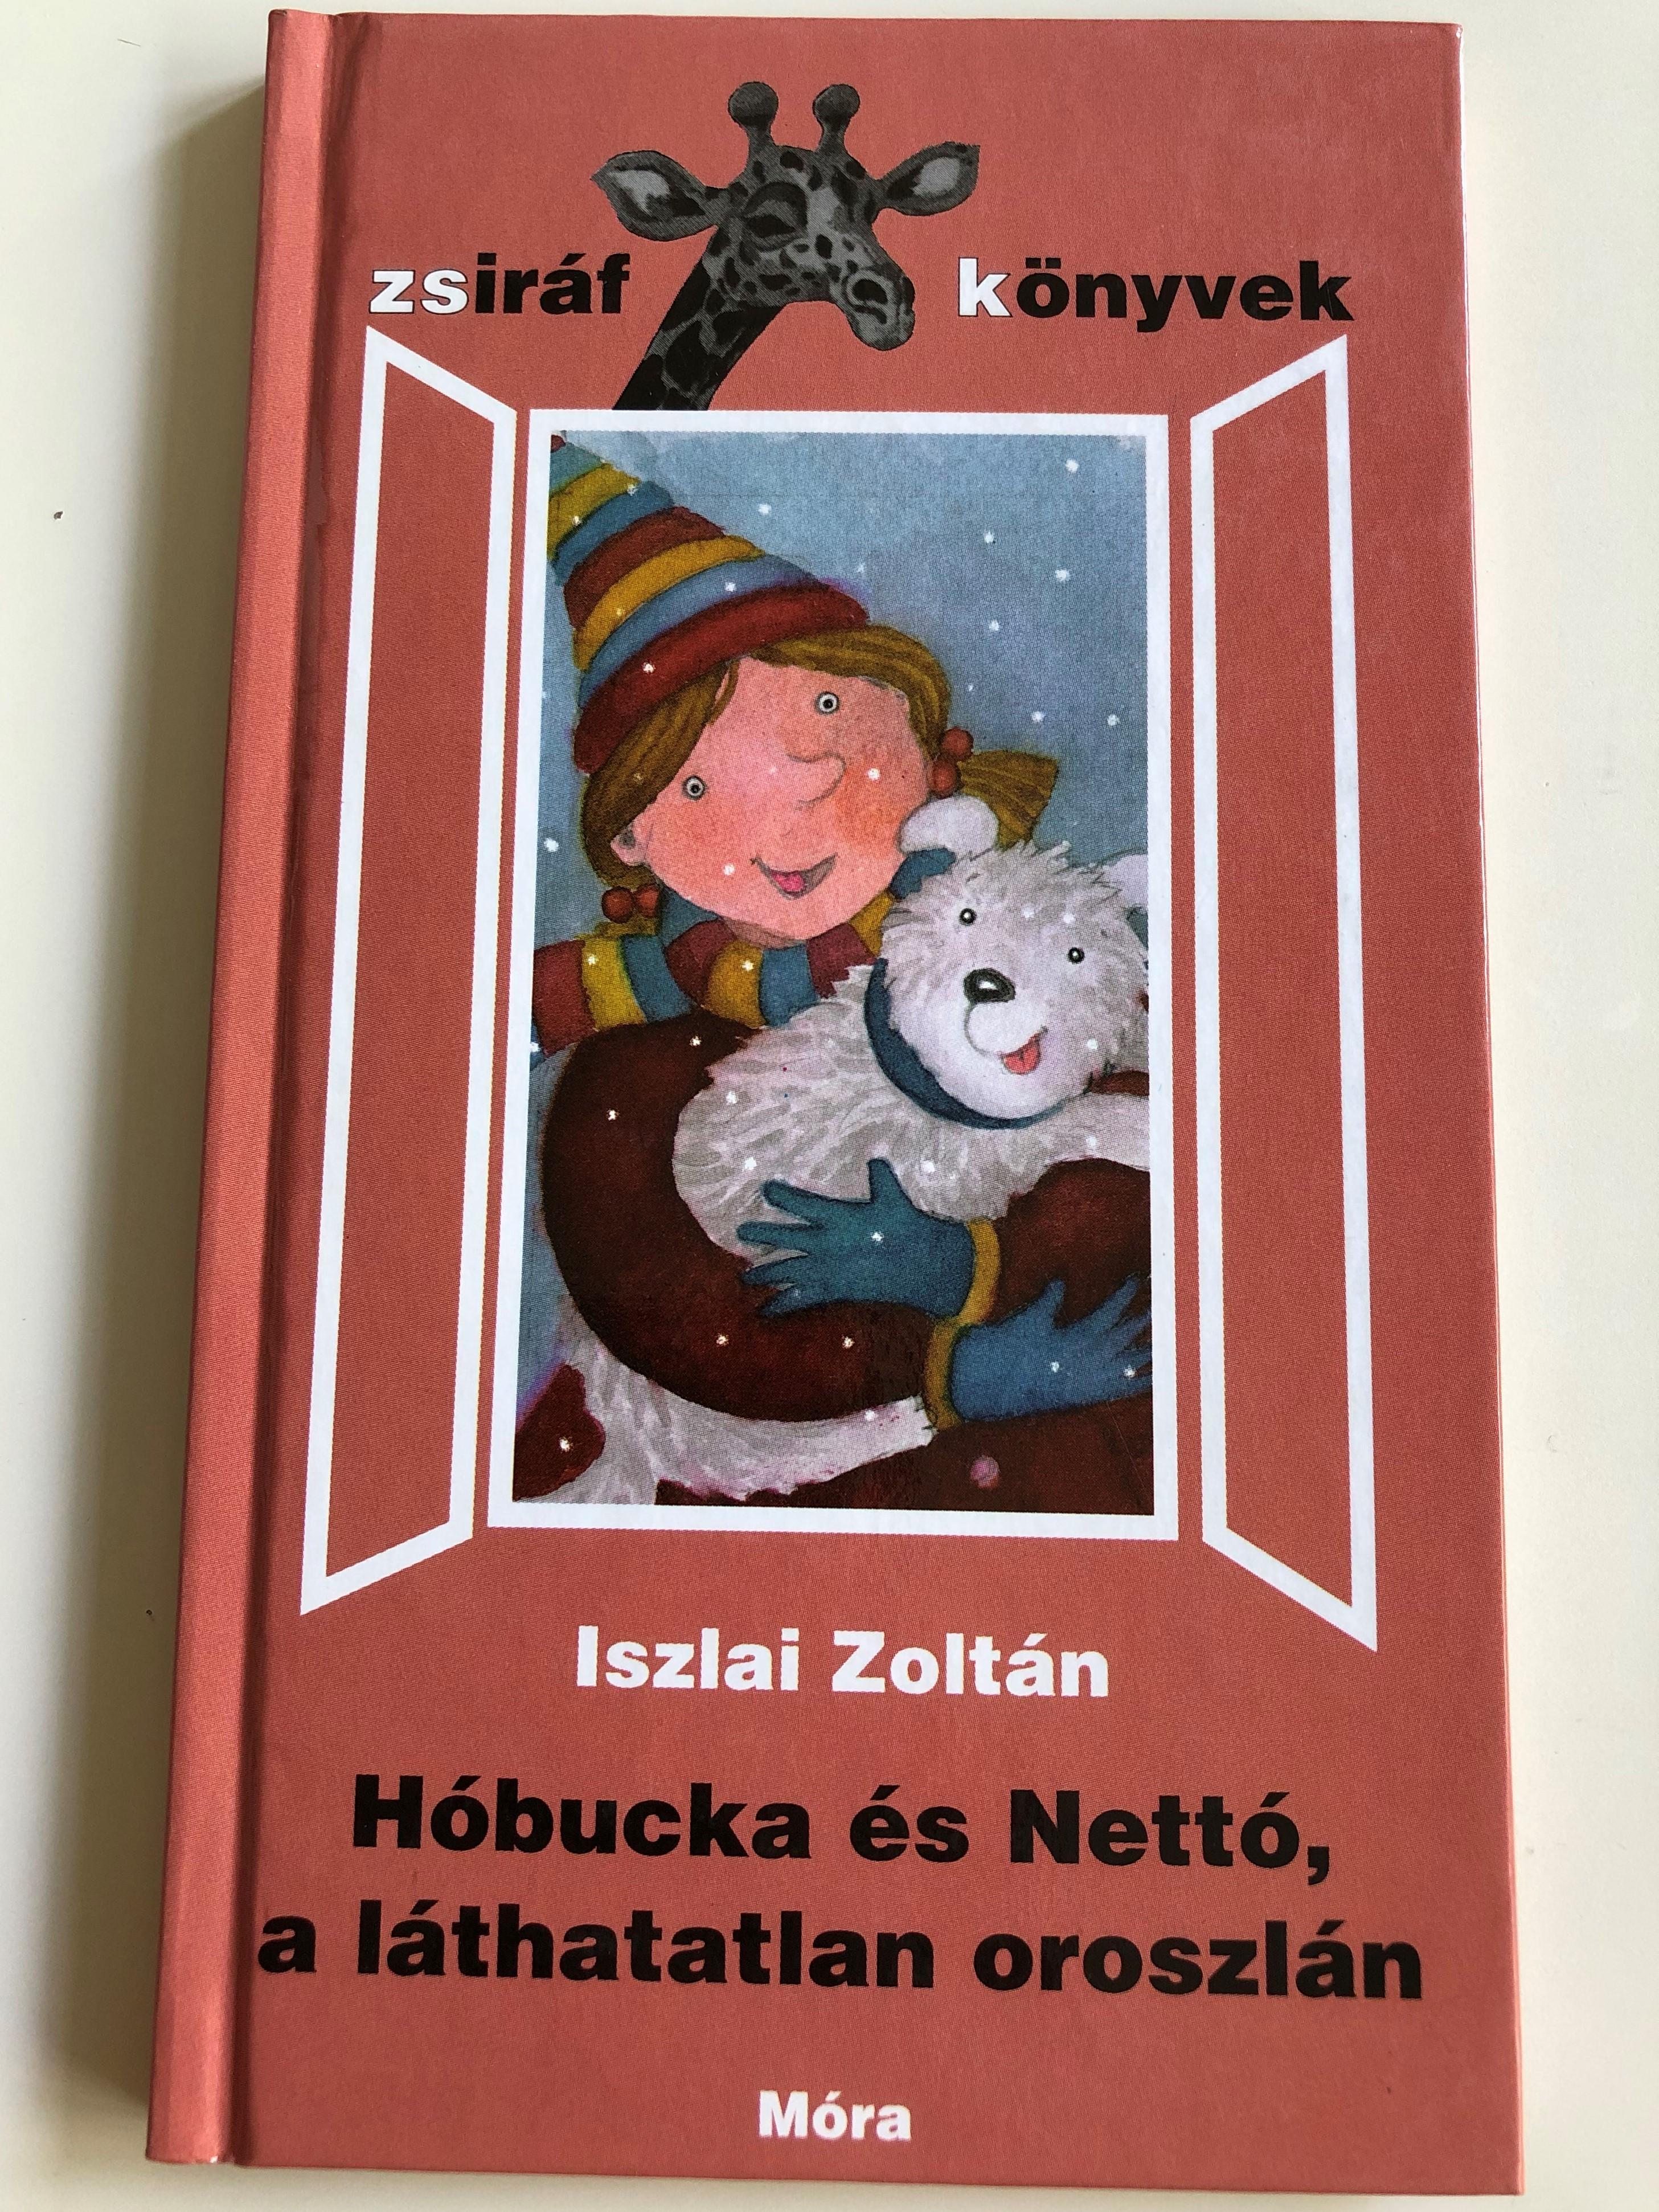 h-bucka-s-nett-a-l-thatatlan-oroszl-n-by-iszlai-zolt-n-hungarian-stories-about-an-invisible-lion-zsir-f-k-nyvek-m-ra-k-nyvkiad-2005-1-.jpg